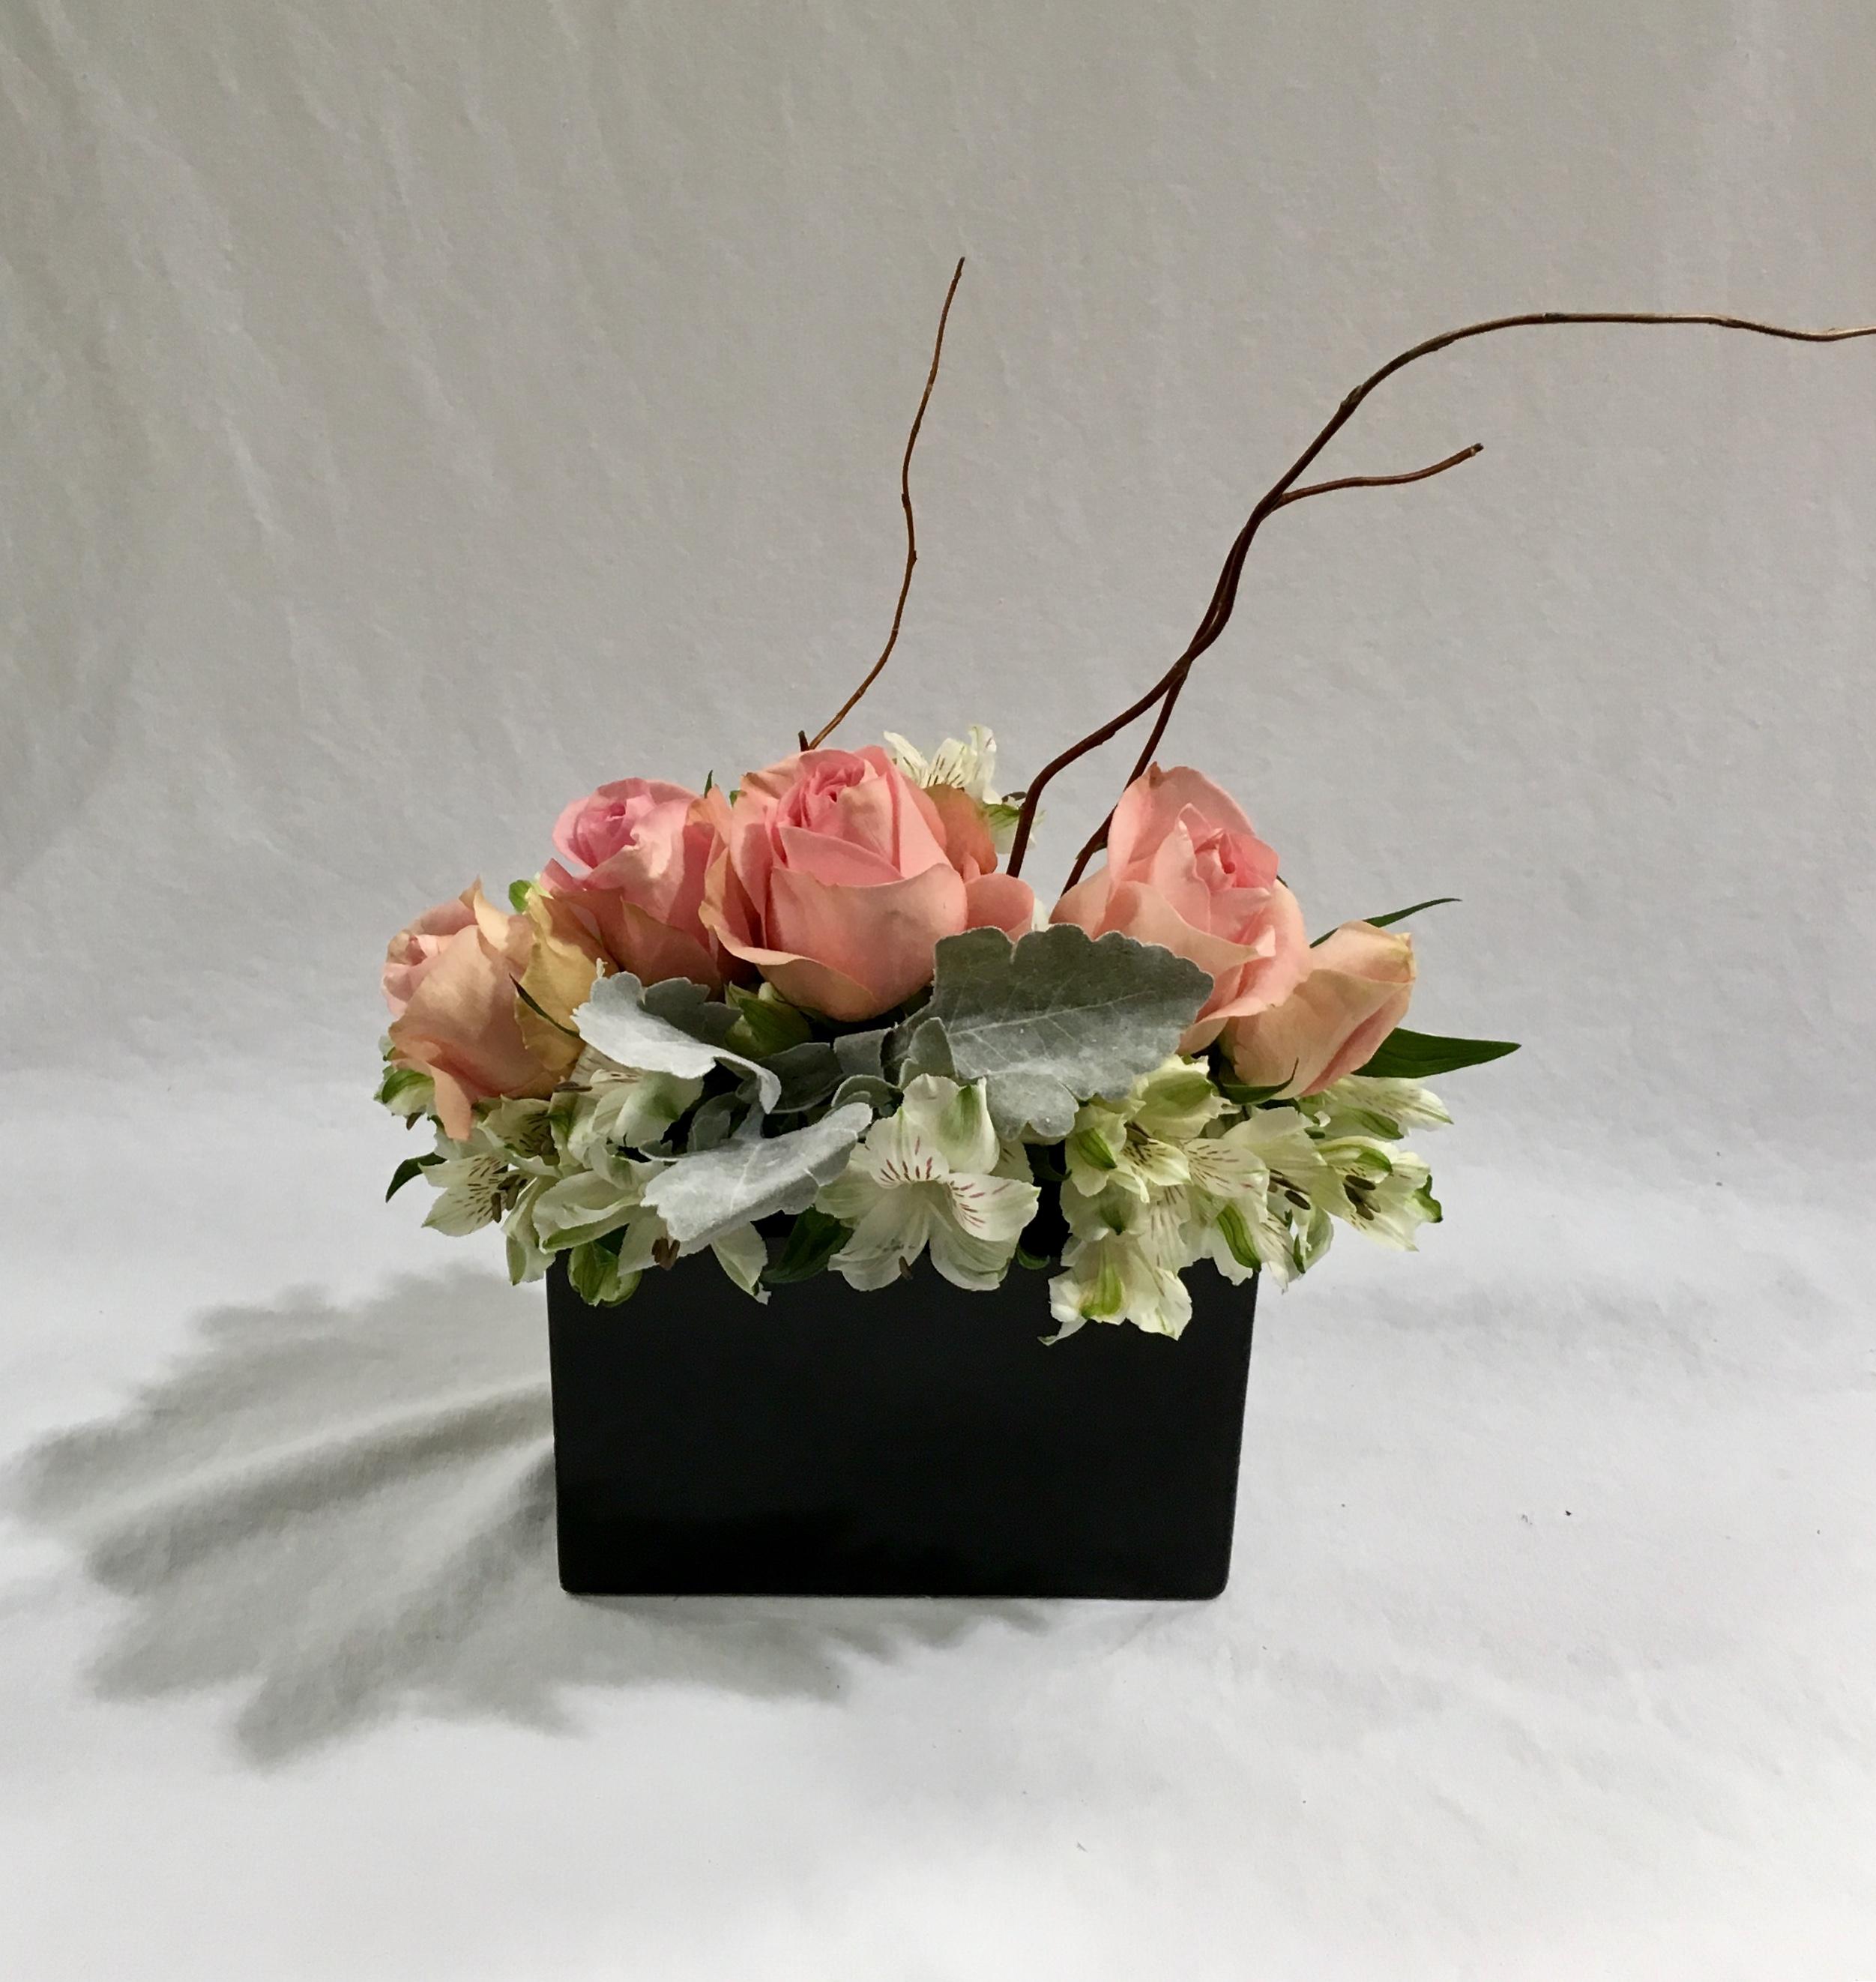 Valentines Day Floral Arrangements Interiorscapes Inc